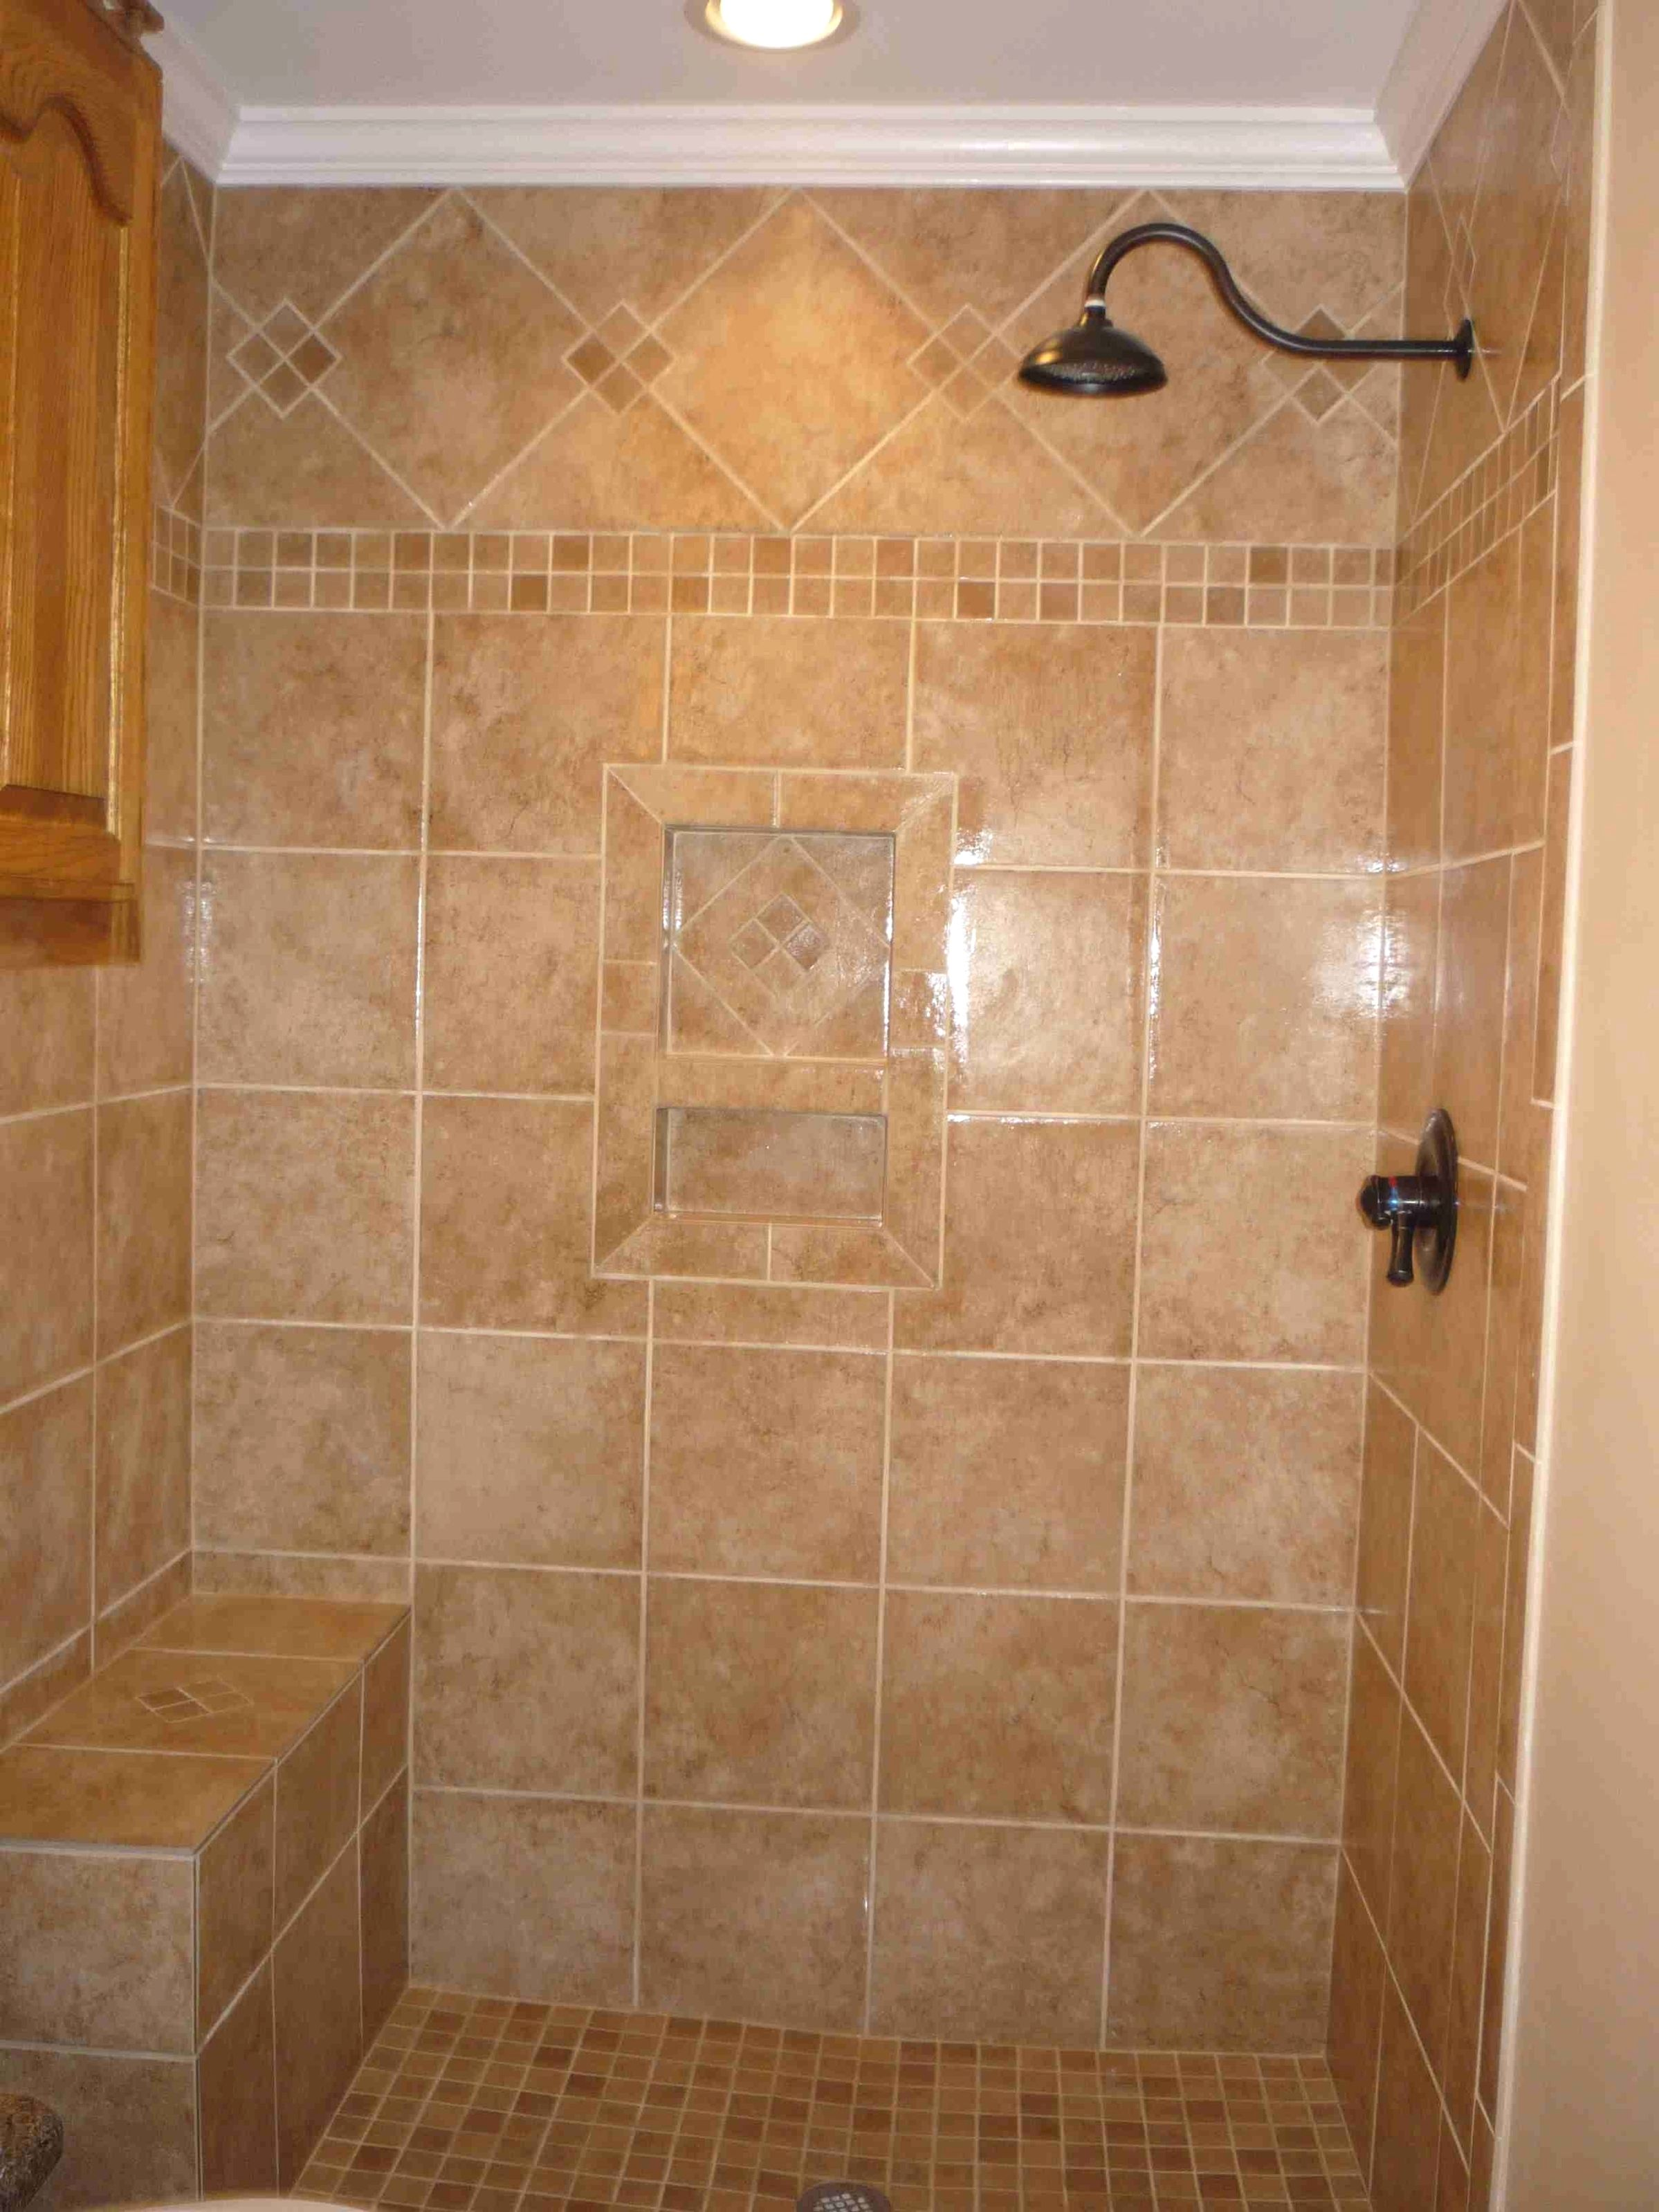 Diy Home Renovation Ideas Remodelingideas Bathroom In 2019